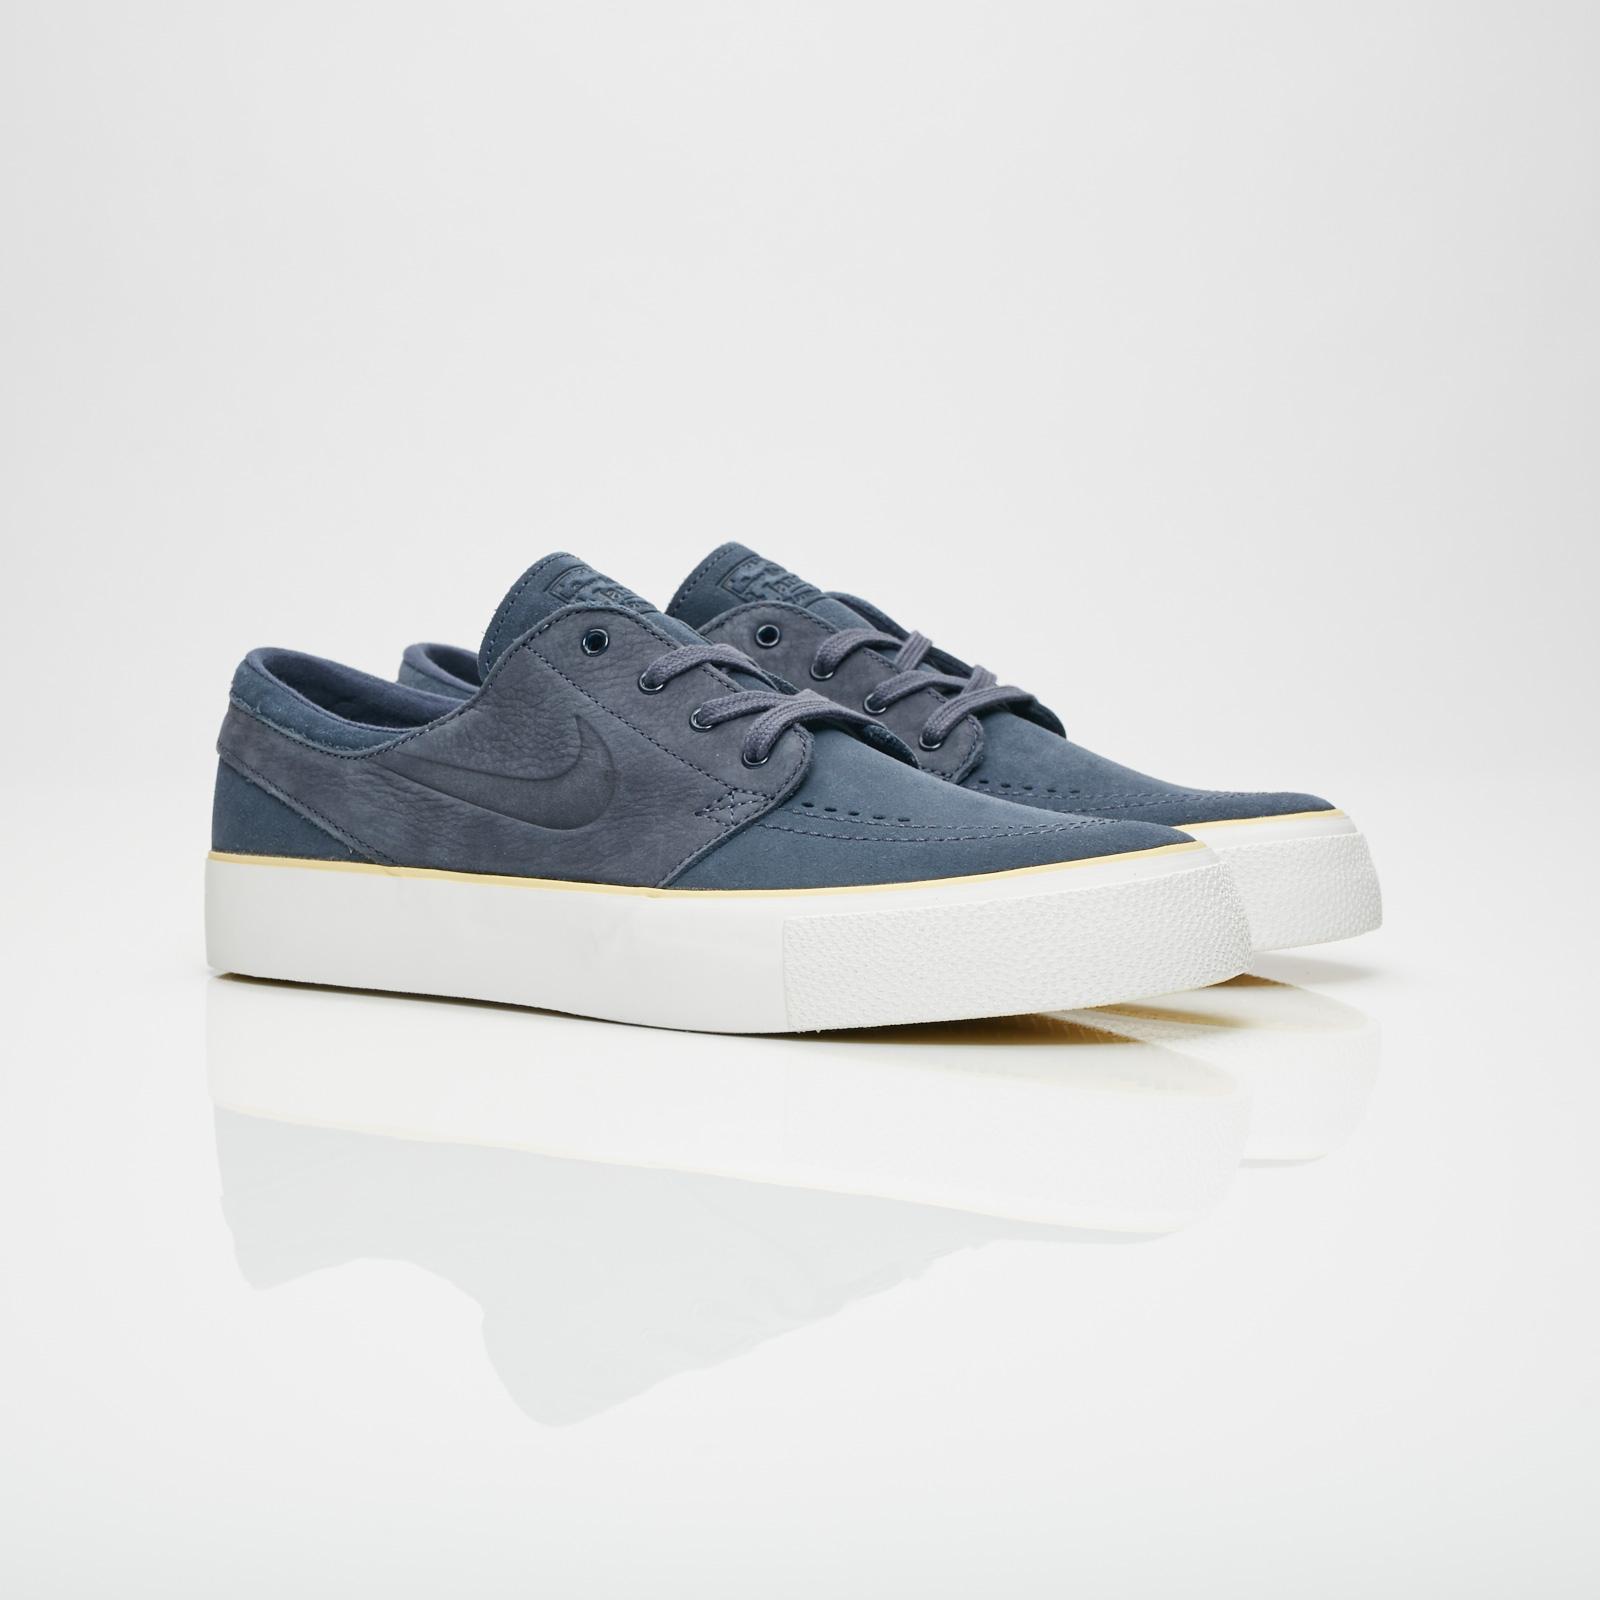 1f4395291250d1 Nike Zoom Janoski HT - Aa4276-400 - Sneakersnstuff